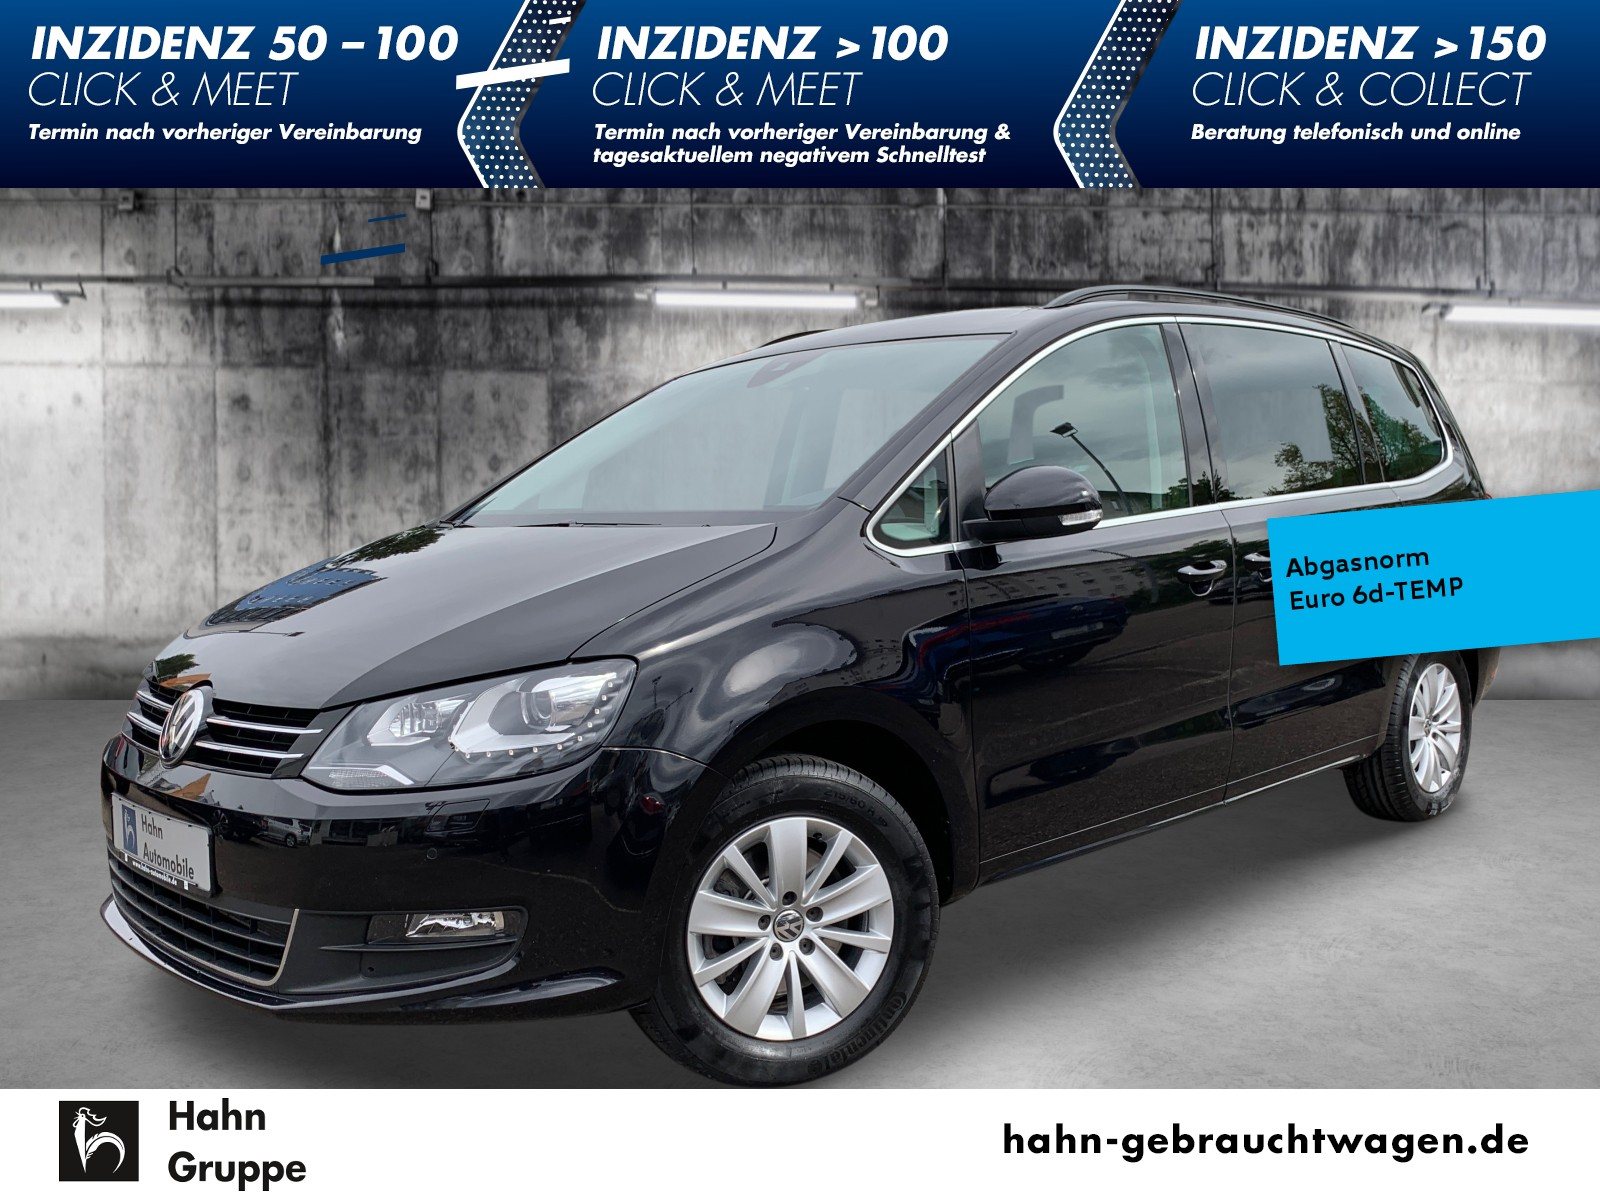 Volkswagen Sharan Comfortline 2,0TDI DSG 7-Sitz Nav Xen AHK, Jahr 2019, Diesel